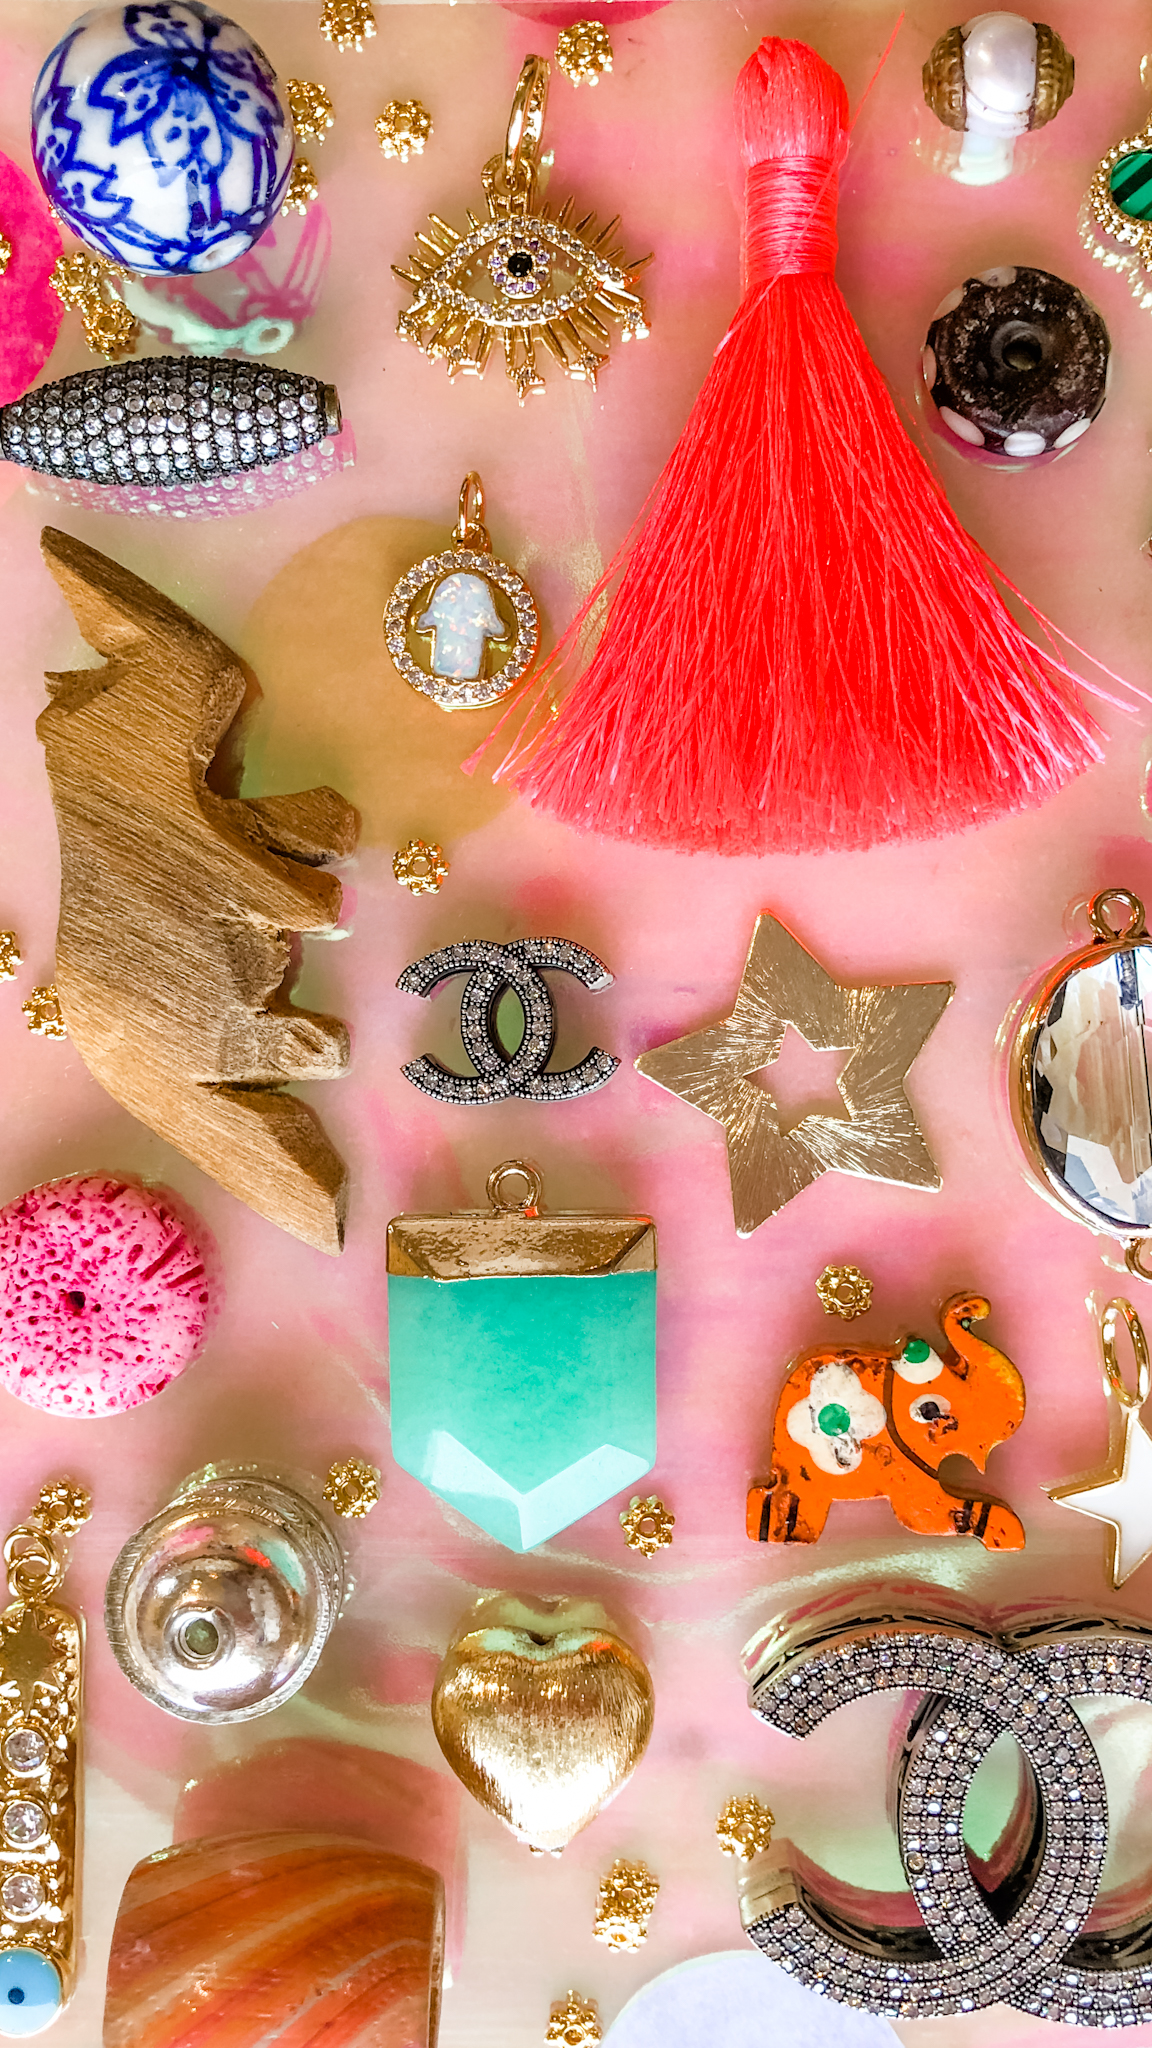 loose beads, charms, pendants